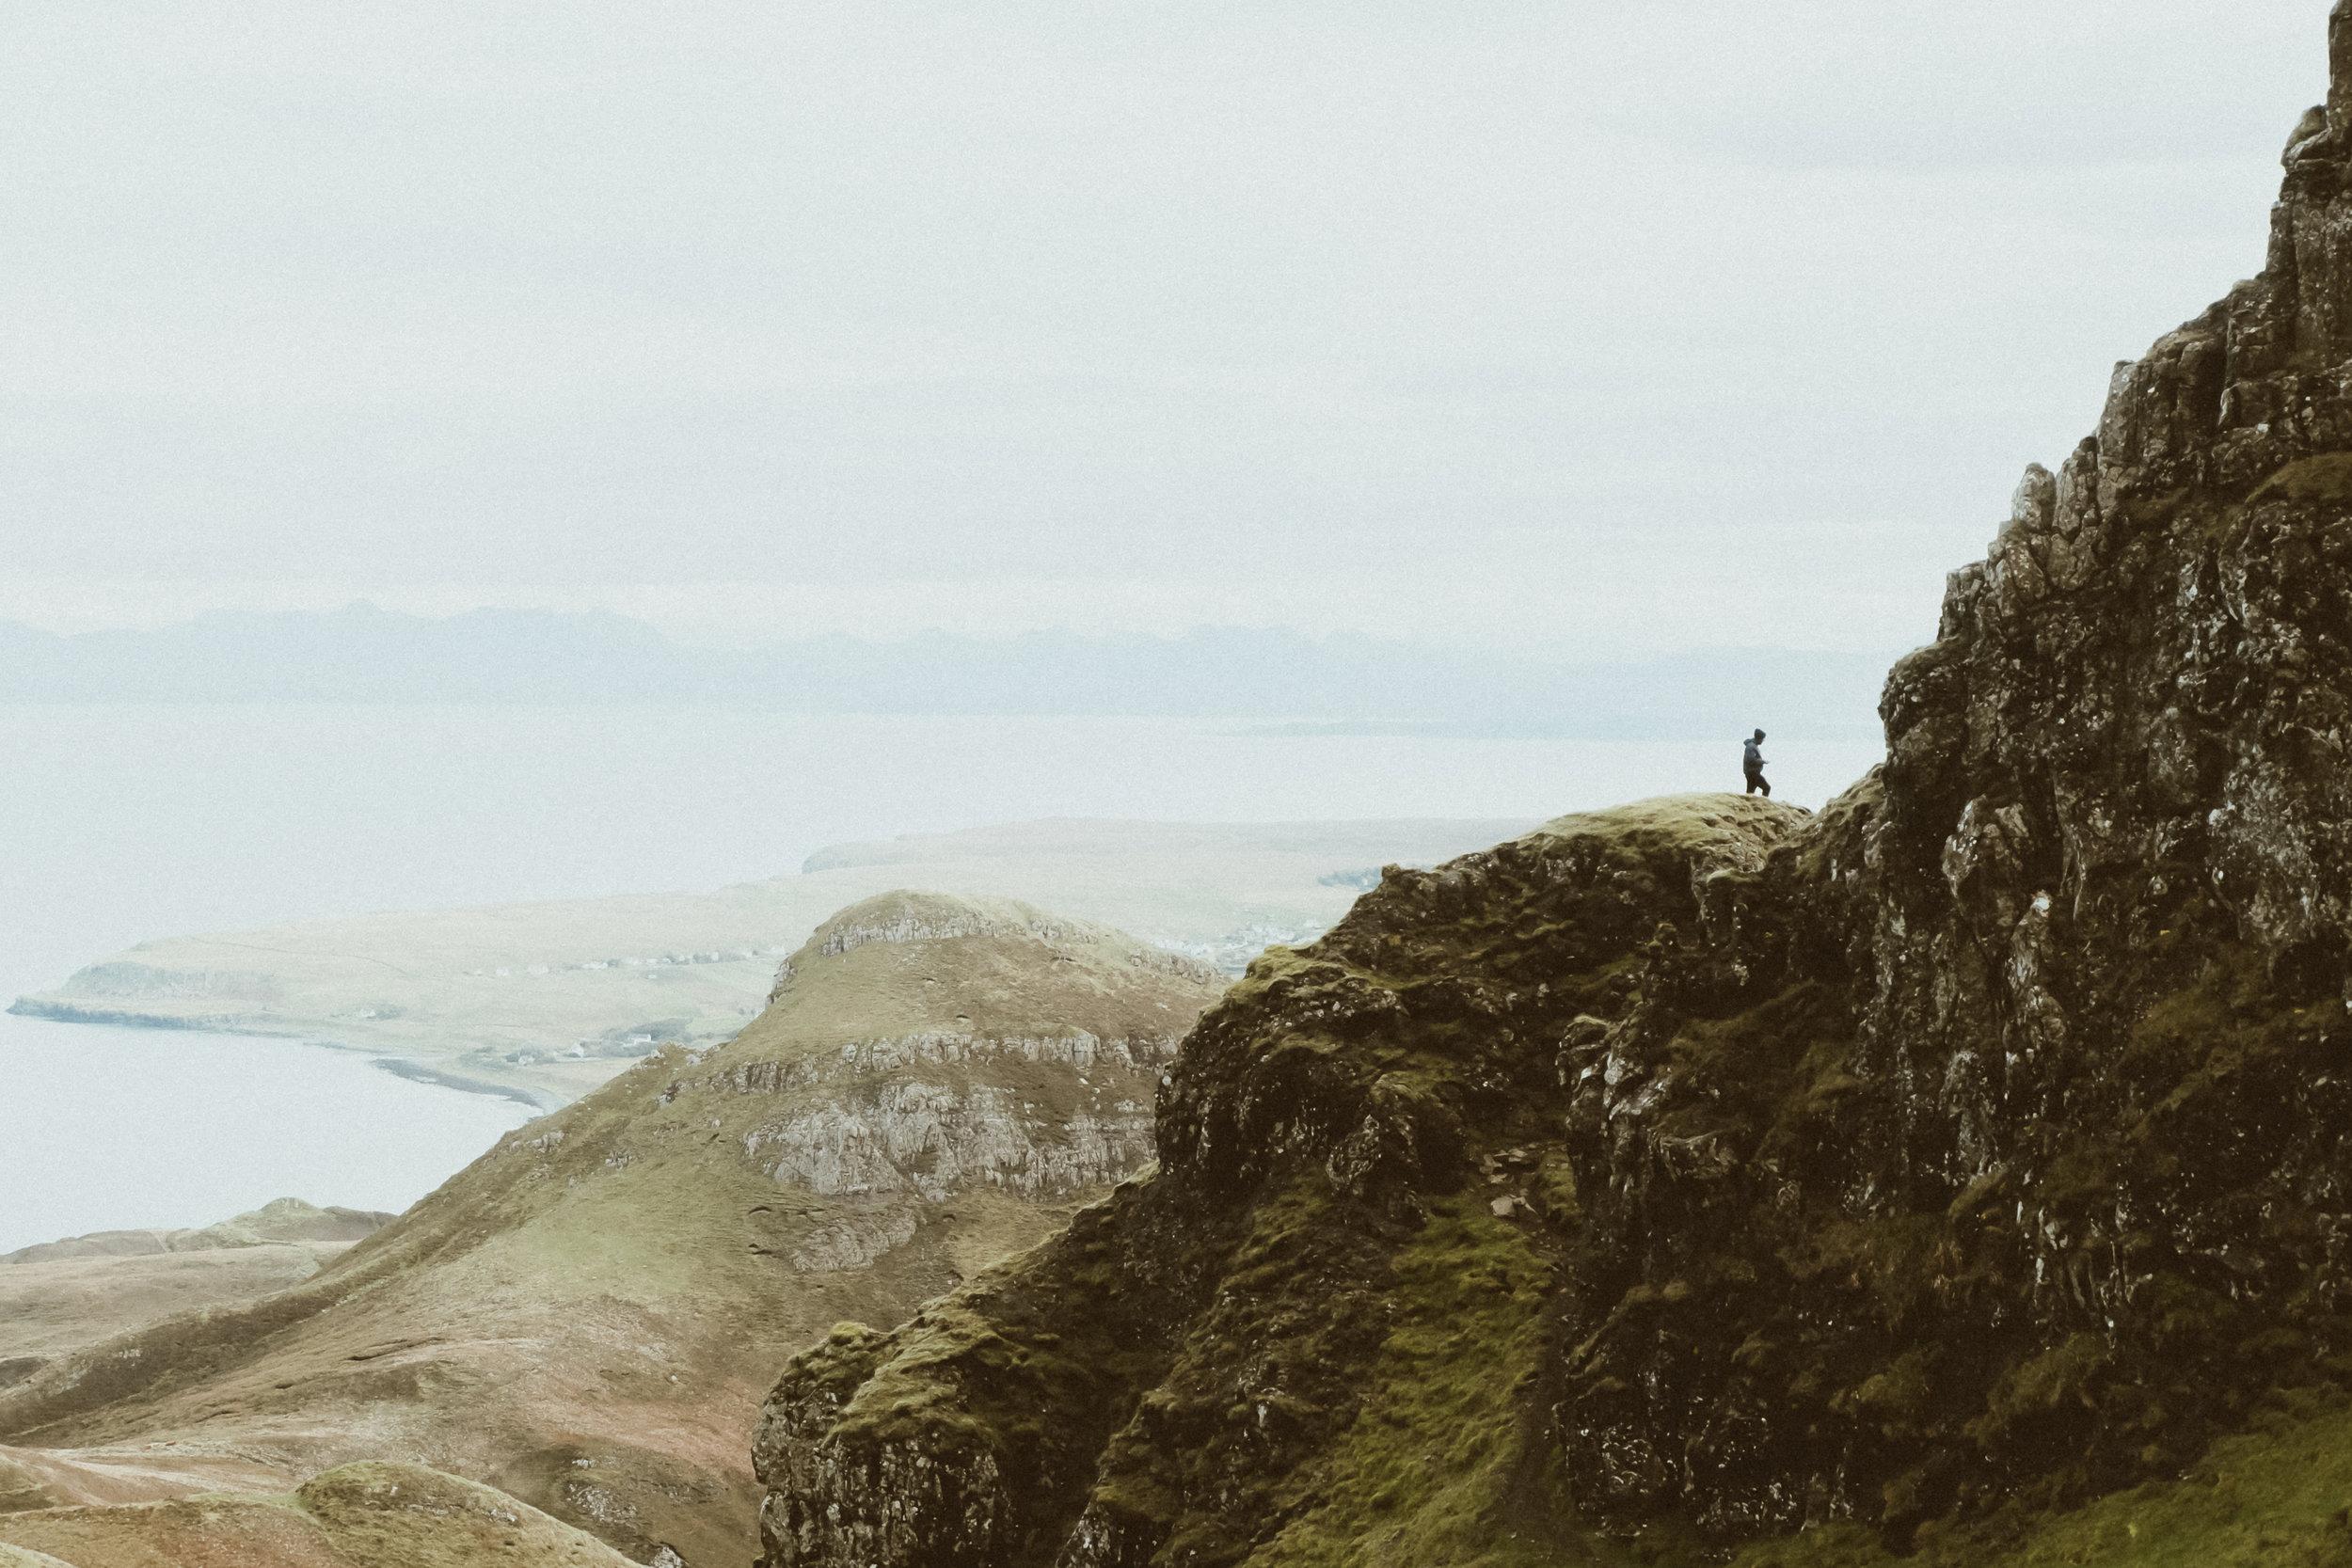 Schotland - UK - BLABLABLaaazmjbflibefzefmohezkùfhmoebfhjmzzmjebfhmzlznfmjmzaaaaaa..